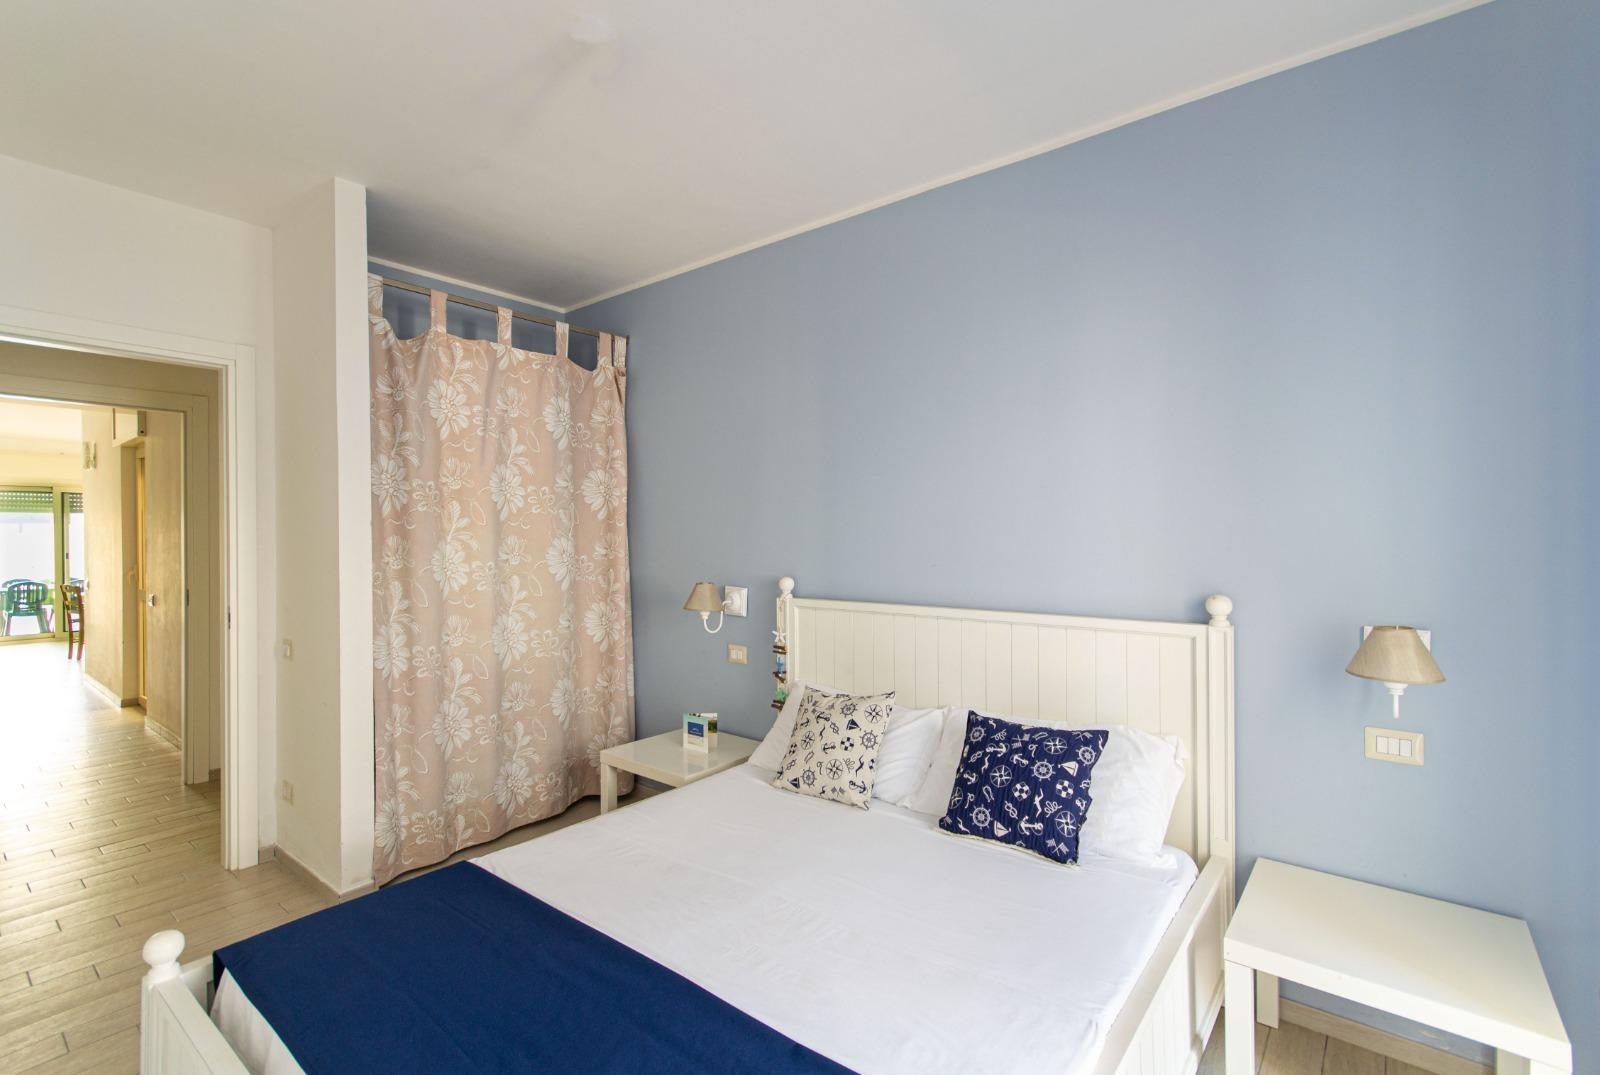 505_appartamento-volta_14._camera_matrimoniale.jpg